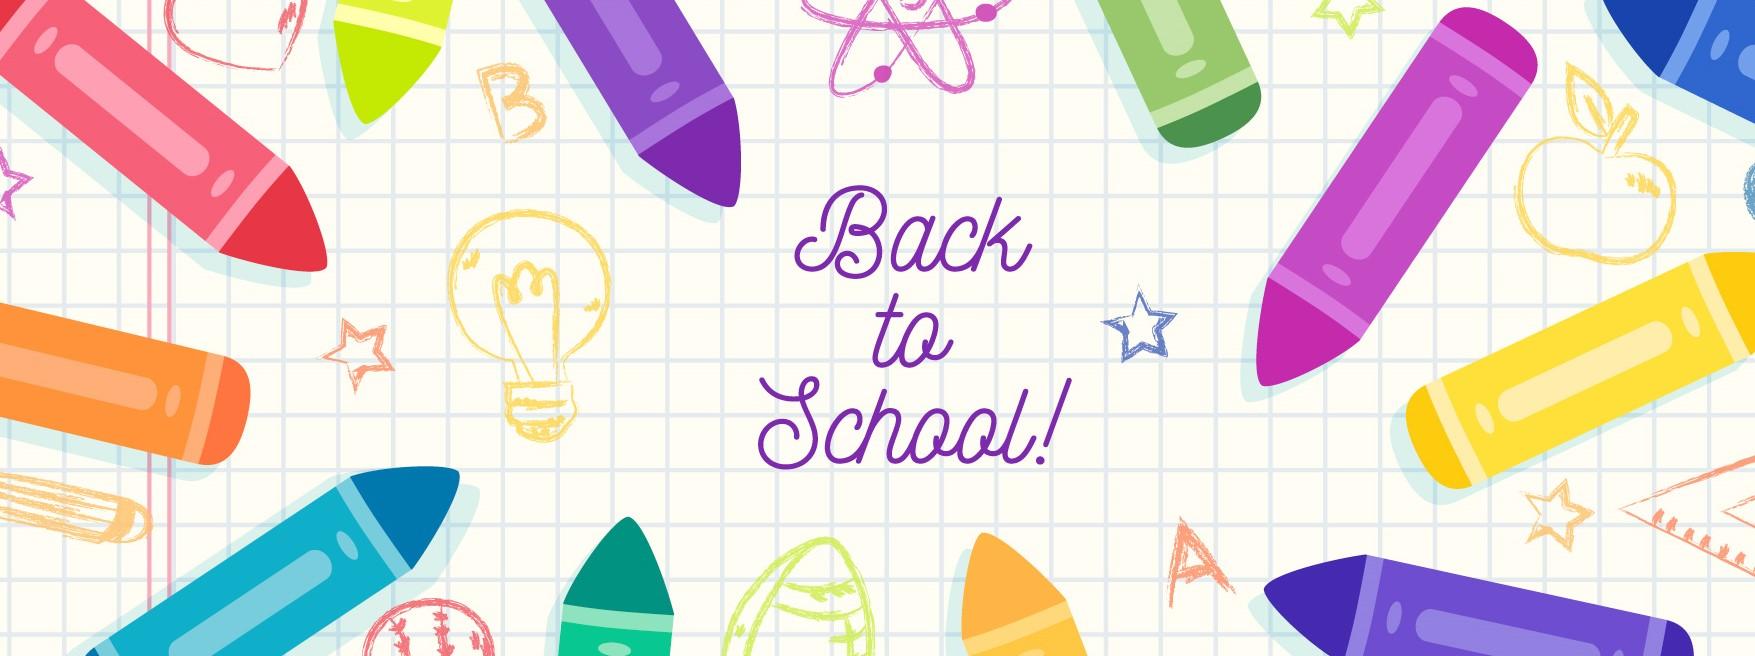 Back to preschool, Preschool, Daycare, Hyderabad, Bangalore, India